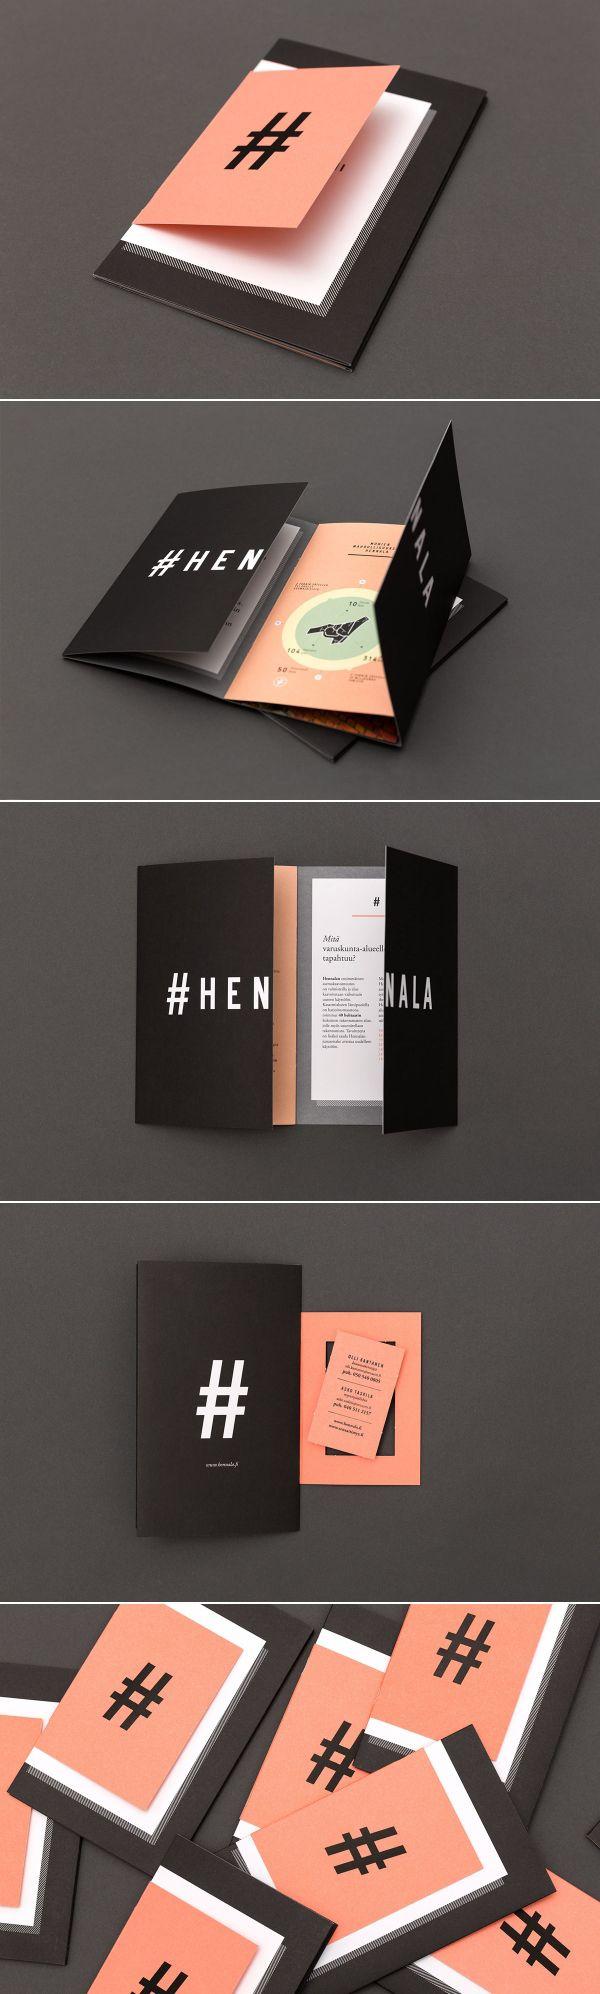 Hennala Visual Identity